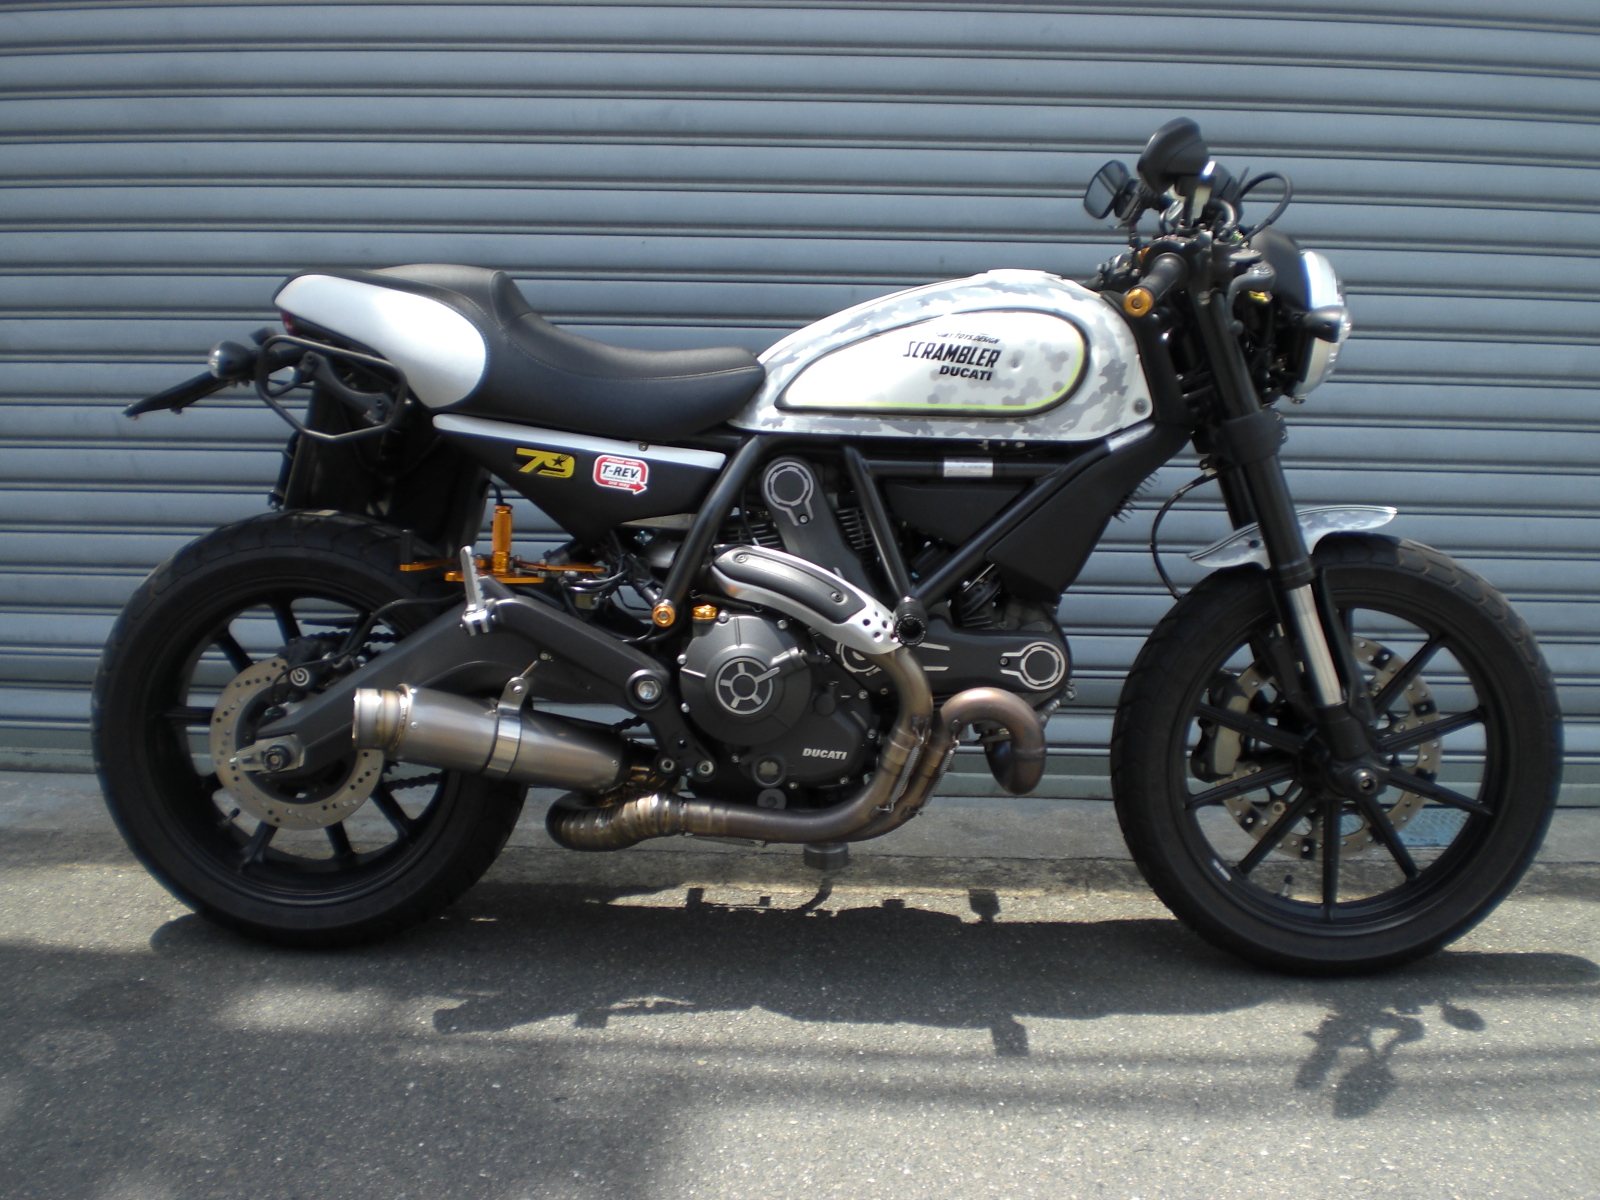 Ducati Scrambler スリップオンサイレンサー